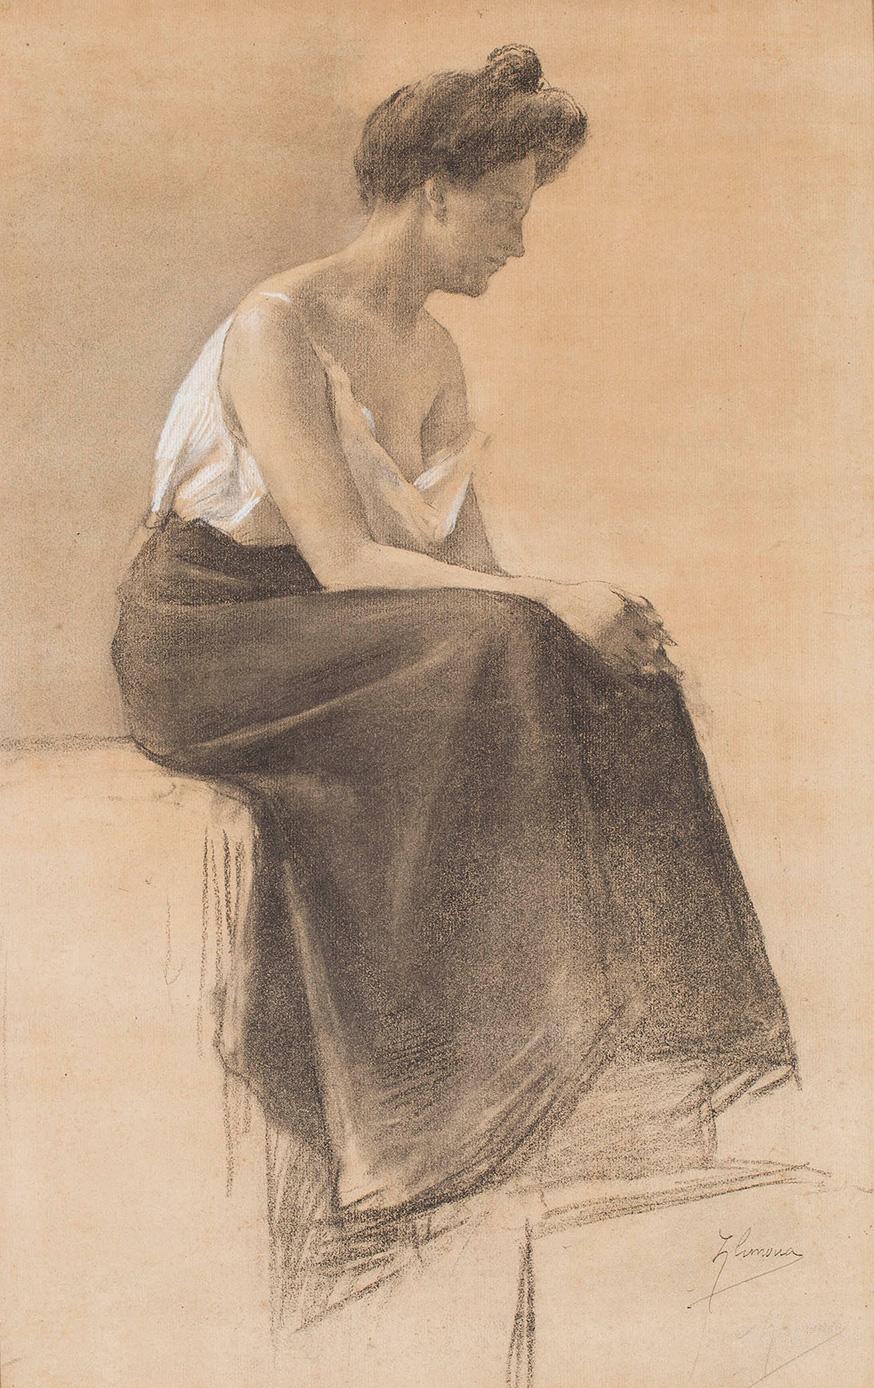 La model, Josep Llimona